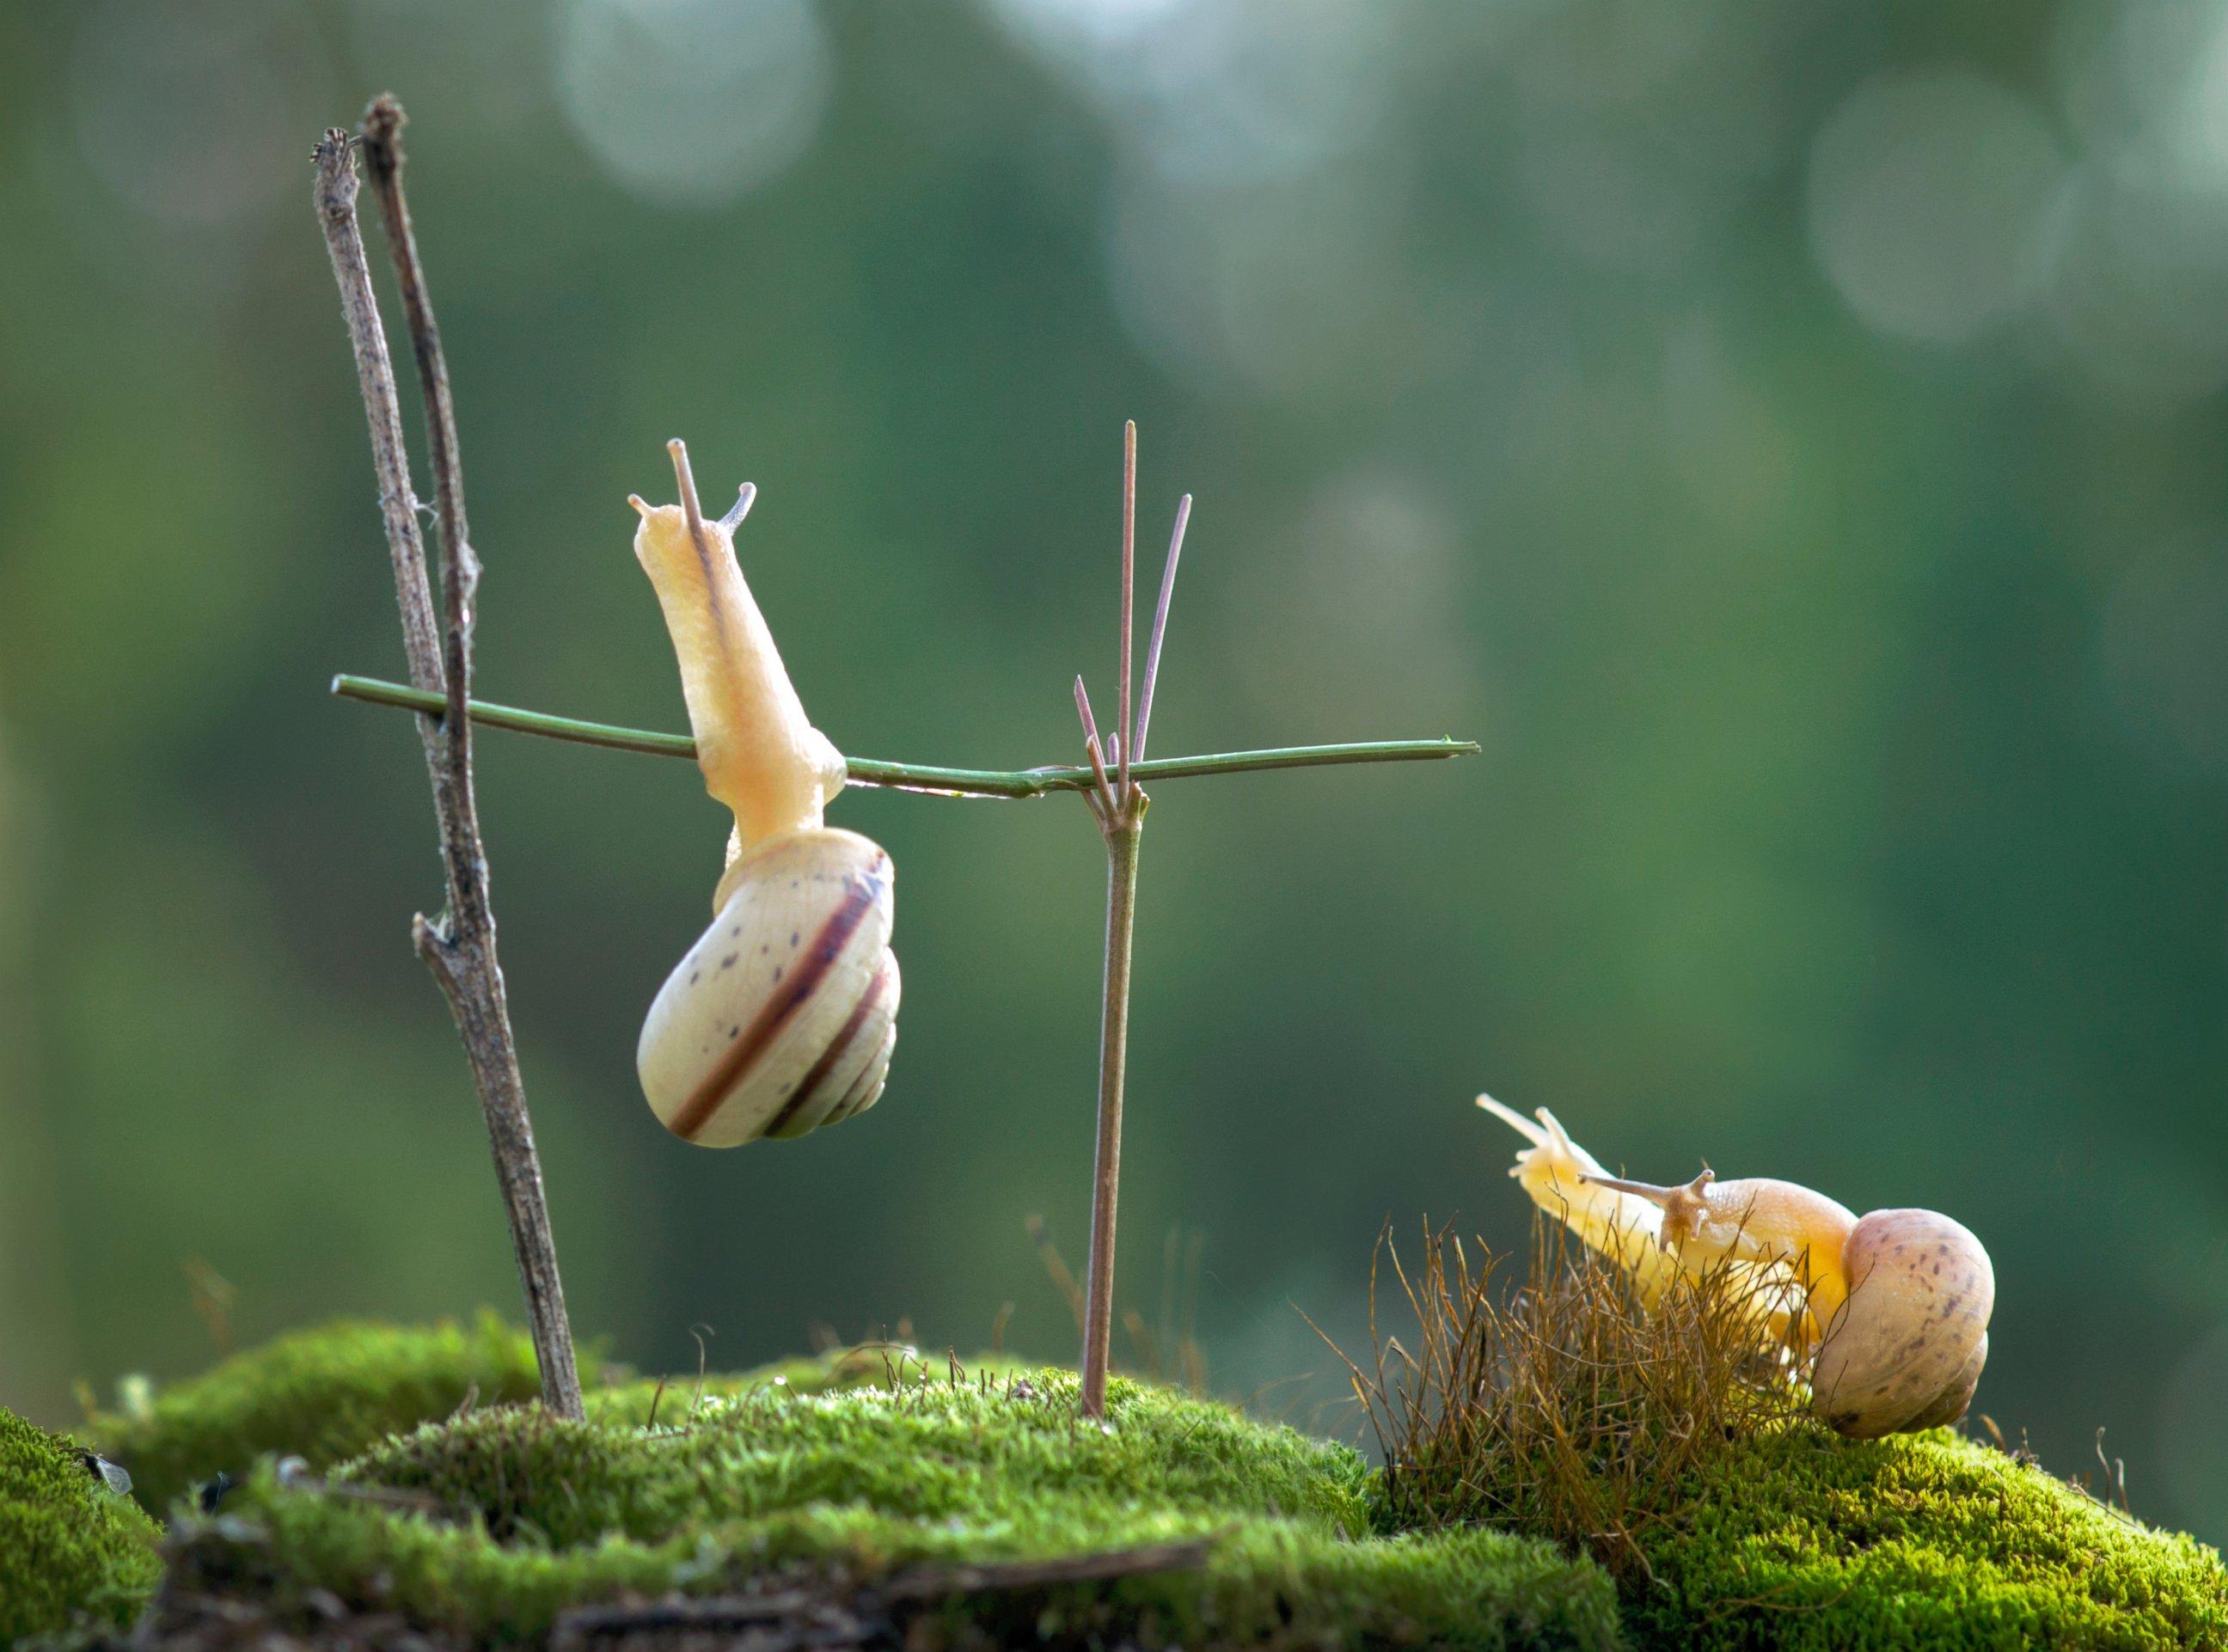 No Pain, No Gain! Snail Does A Chin-Up